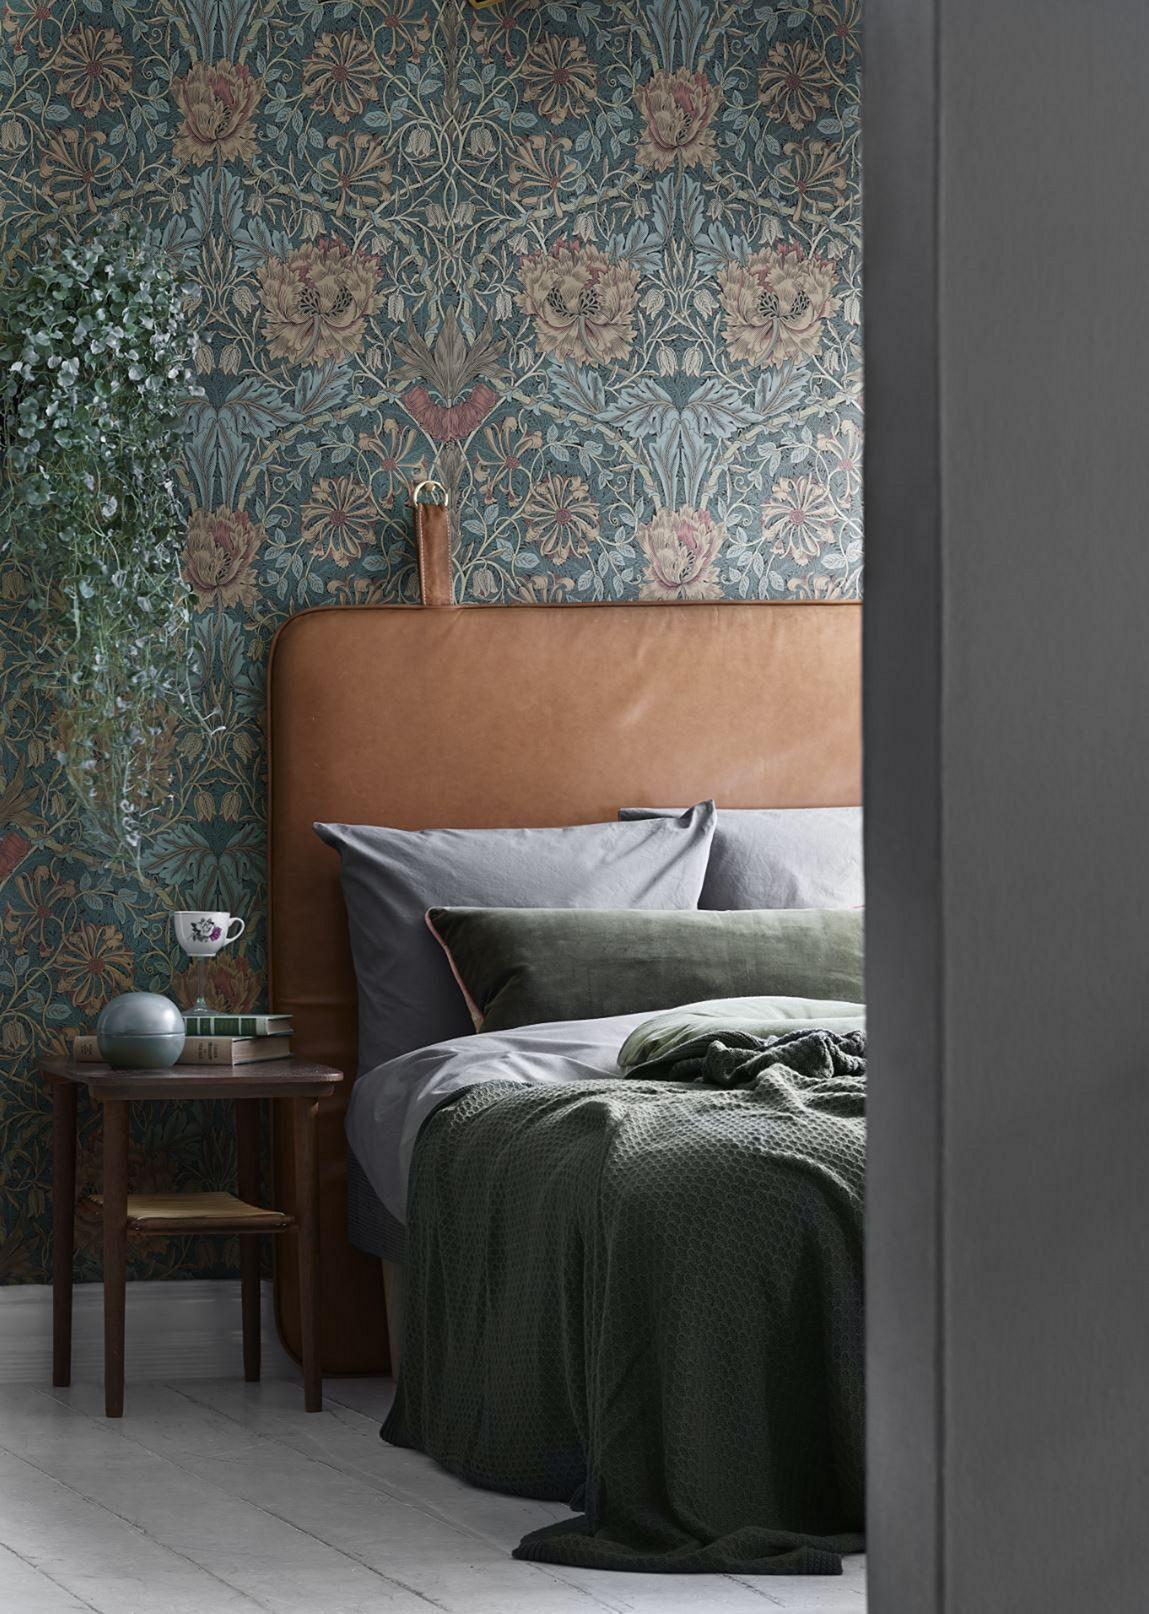 Best Phenomenal 45 Beautiful Bedroom Wallpaper Decorating 640 x 480